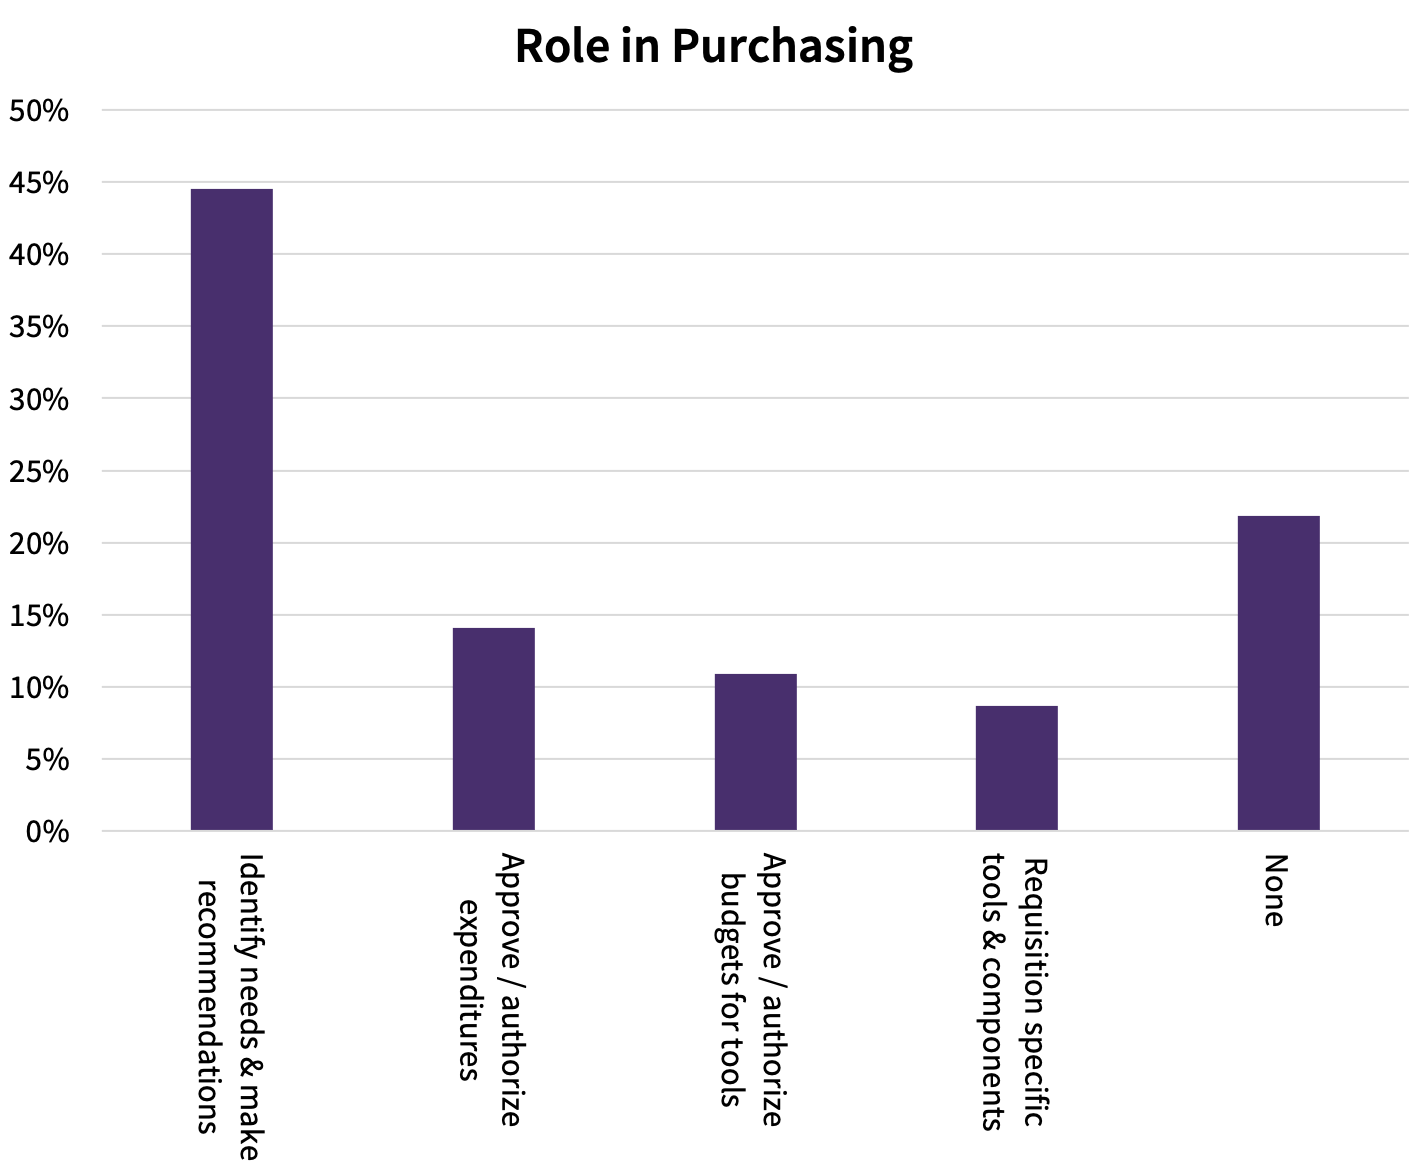 DeveloperMedia User Survey Role in Purchasing chart